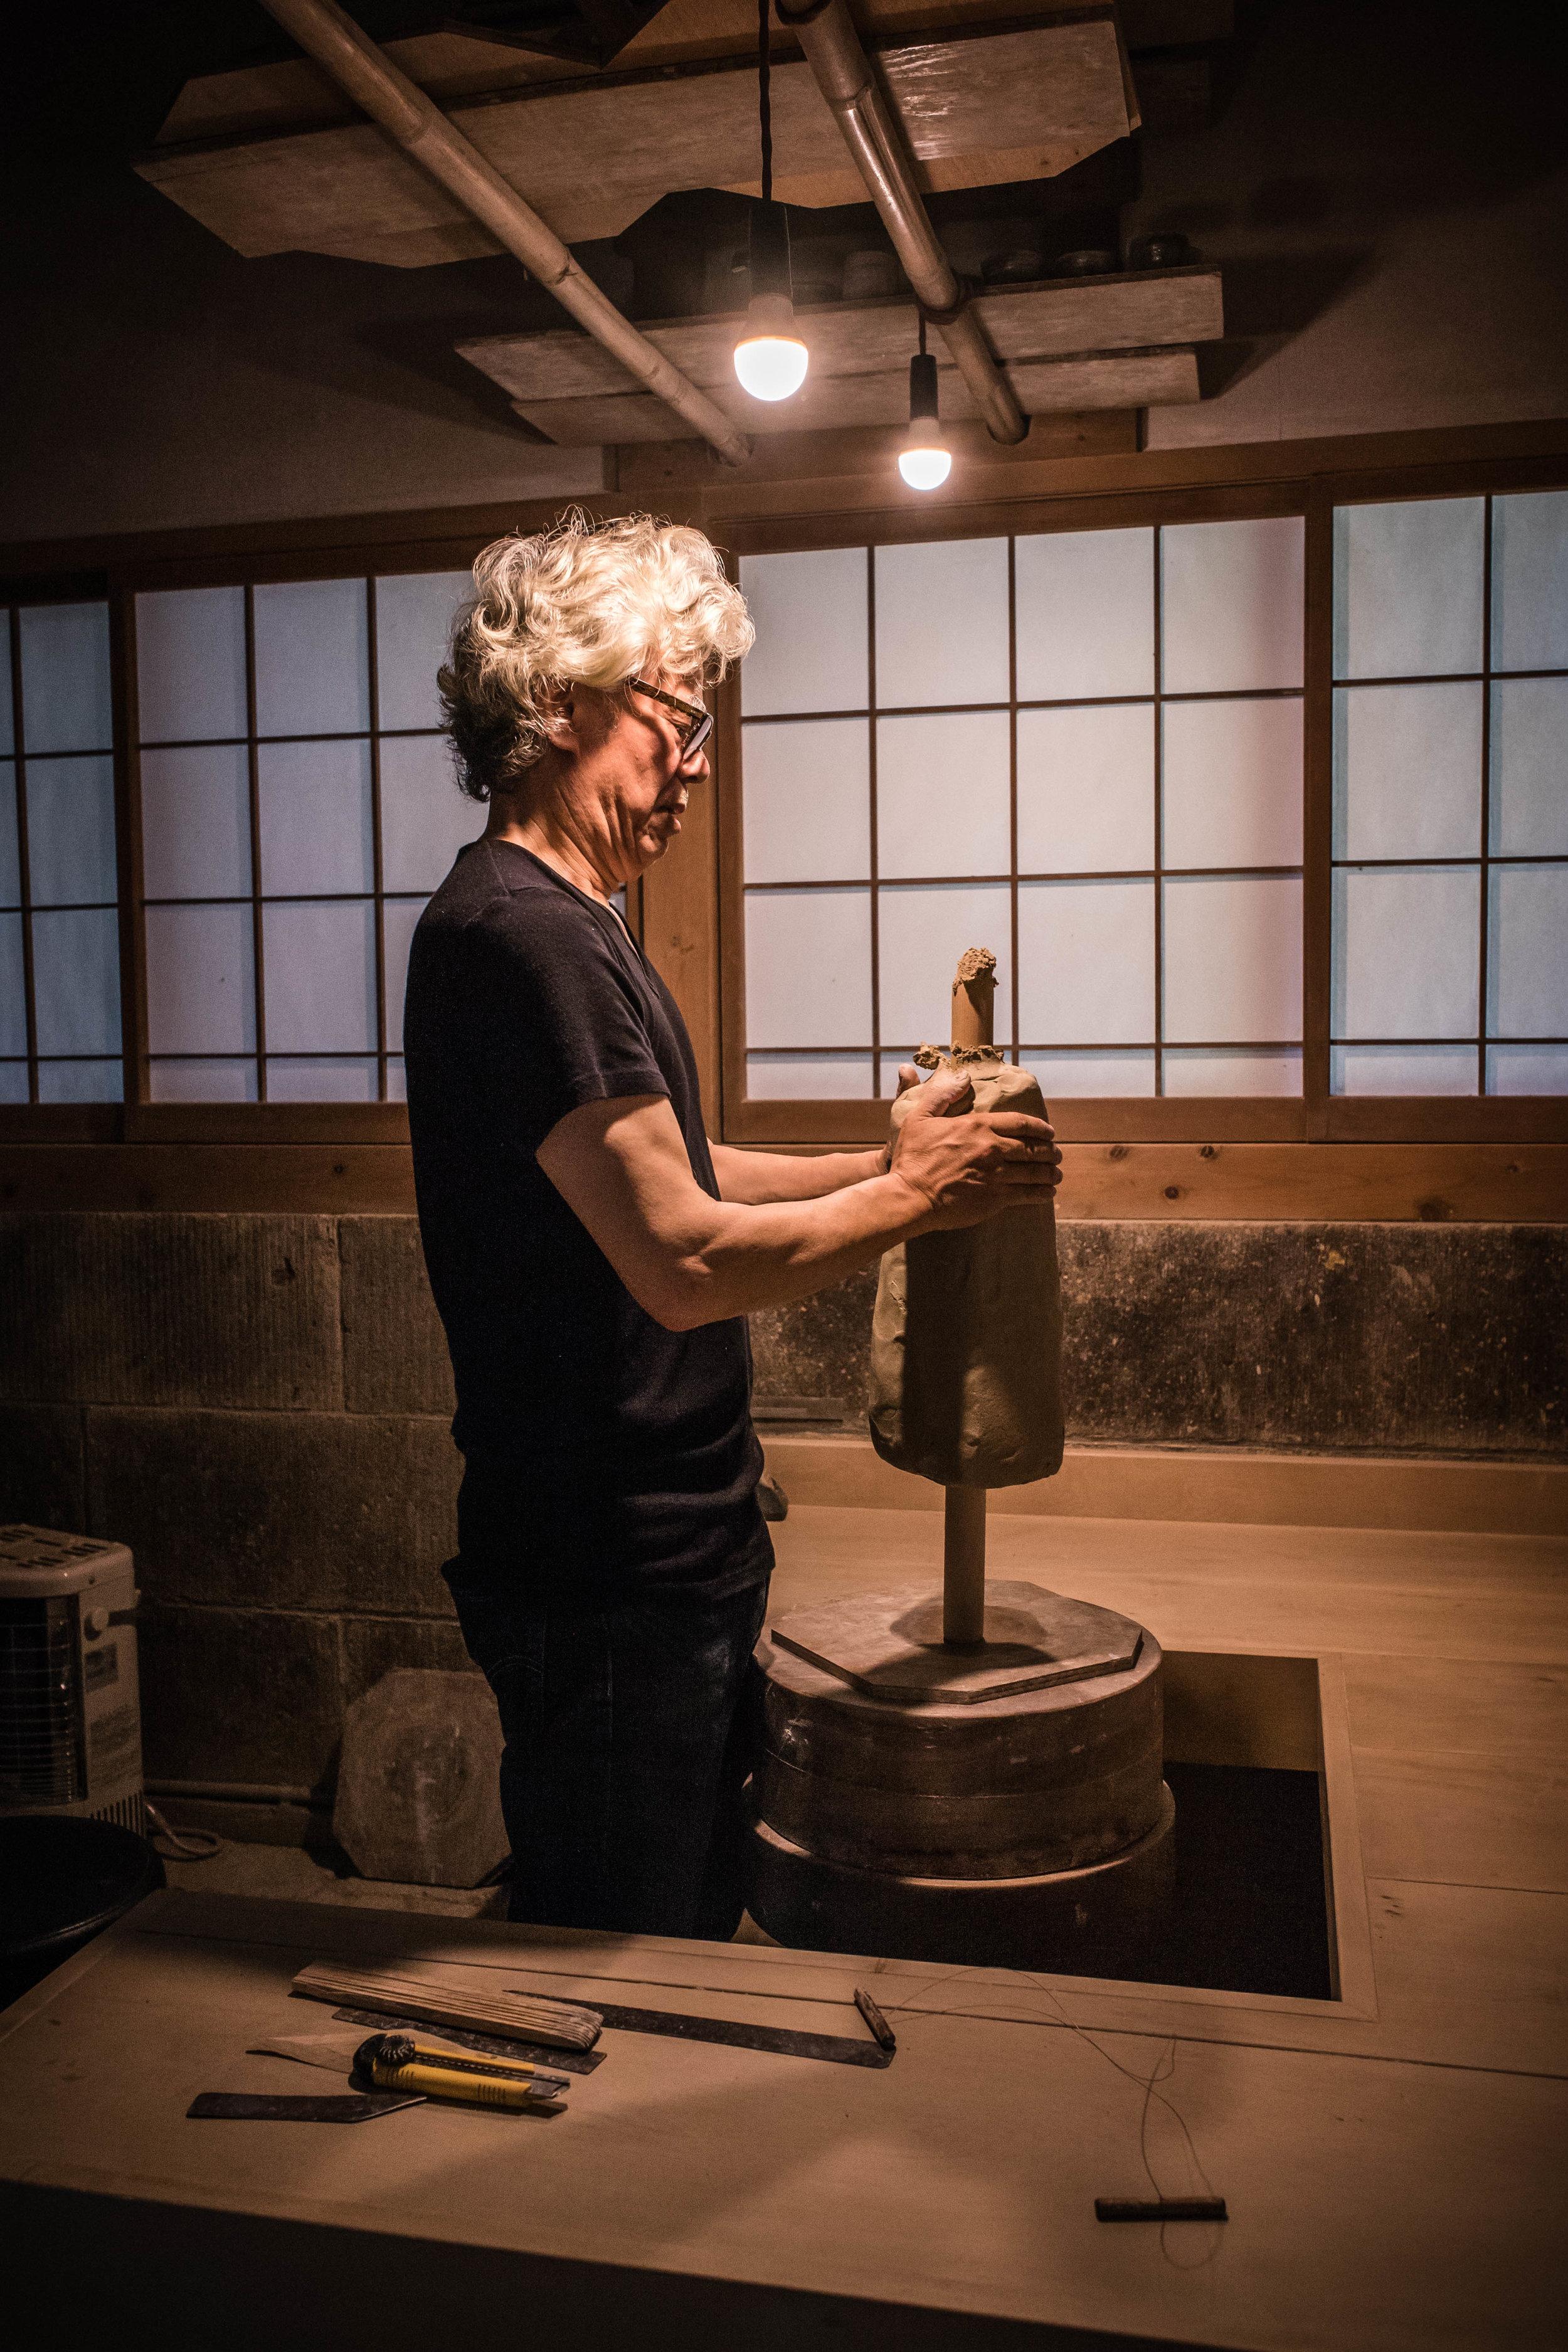 Ken Matsuzaki | the Intangible Spirit - Feature film about Japanese potter for GOLDMARK